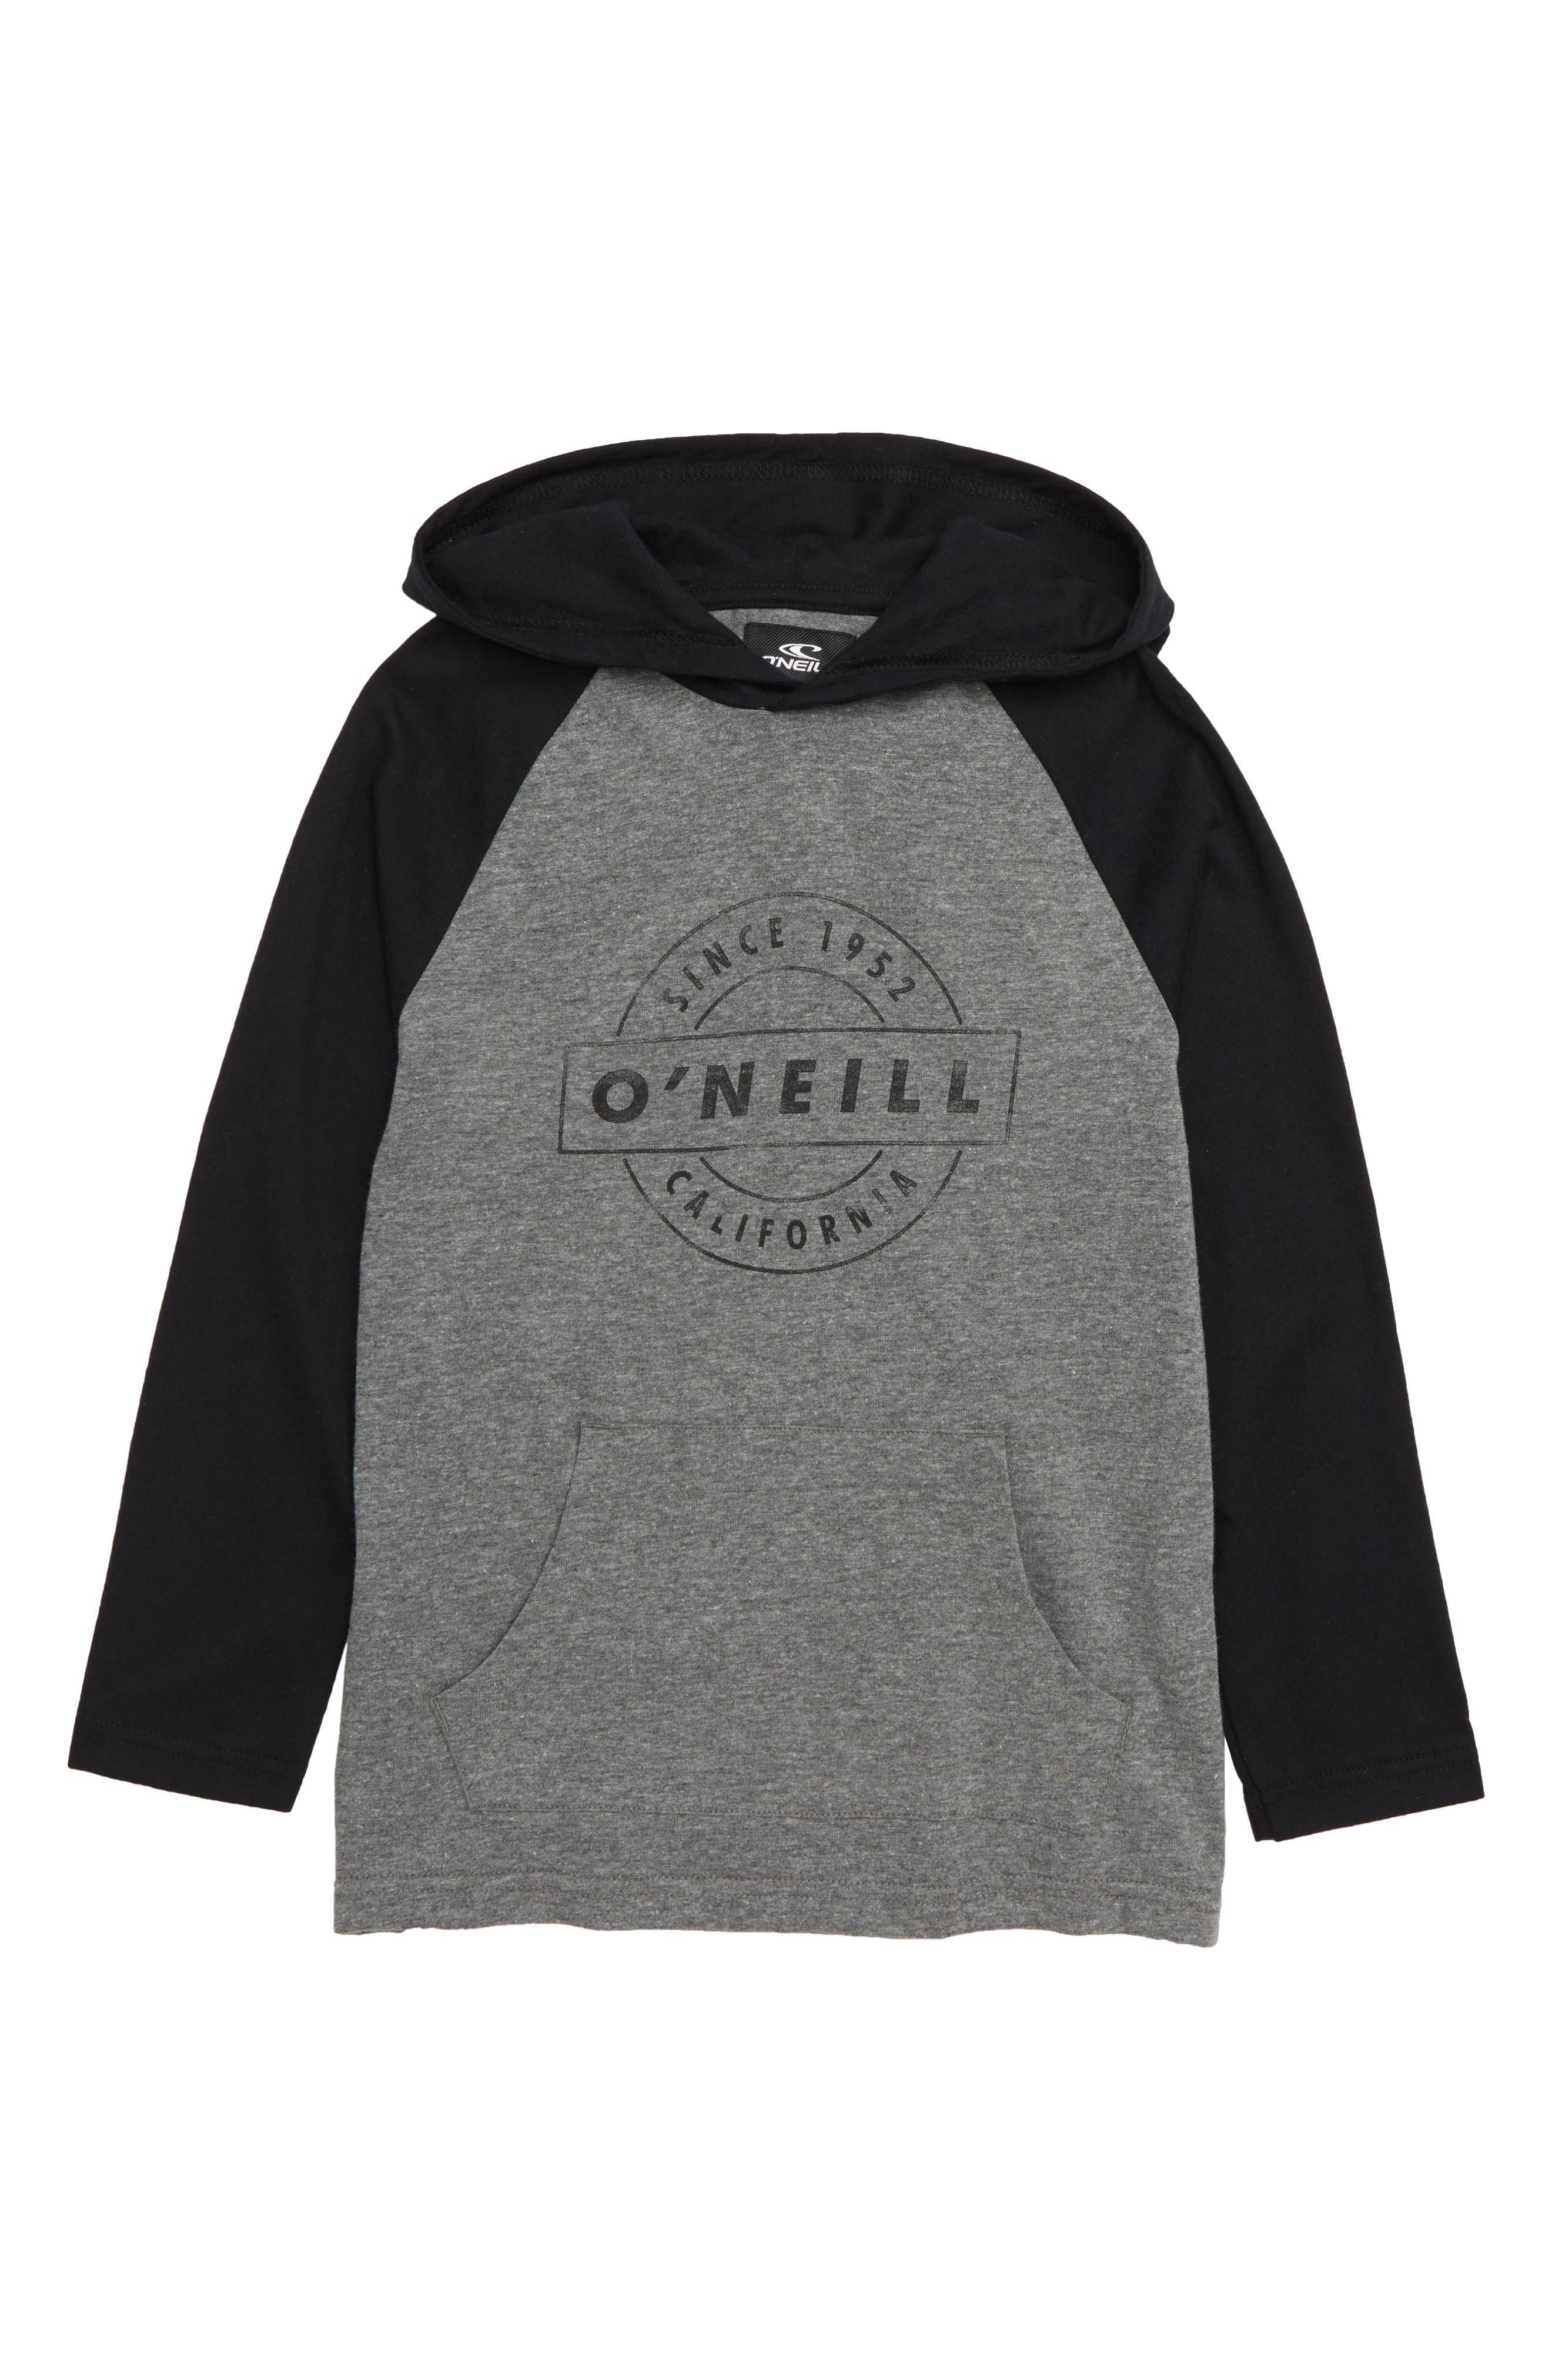 Boys ONeill Mateo Hooded TShirt Size L (7)  Grey